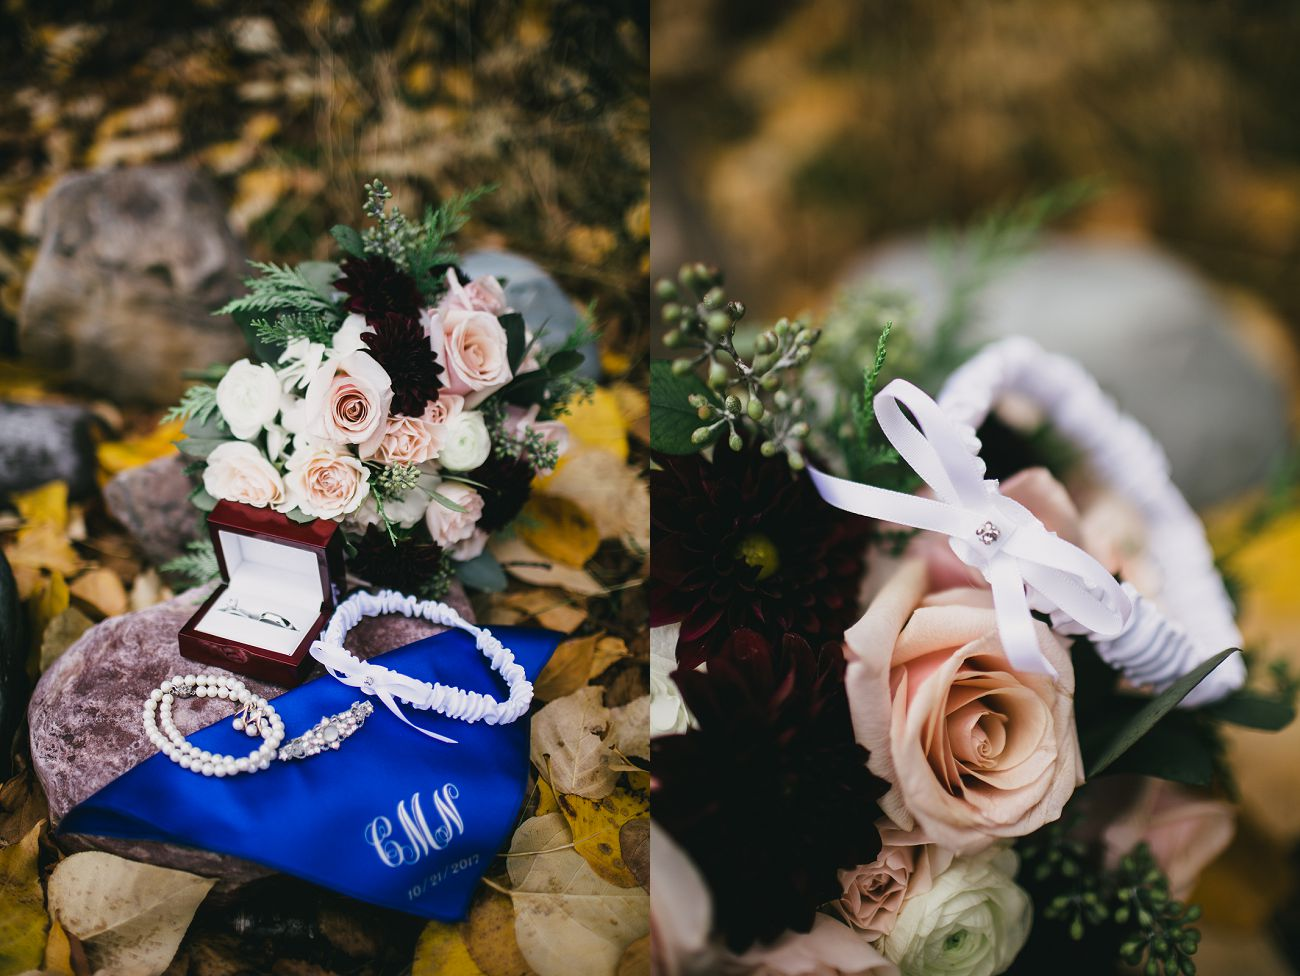 Jennifer_Mooney_Photo_Whitefish_mountain_resort_wedding_elegant_montana_wedding_022.jpg